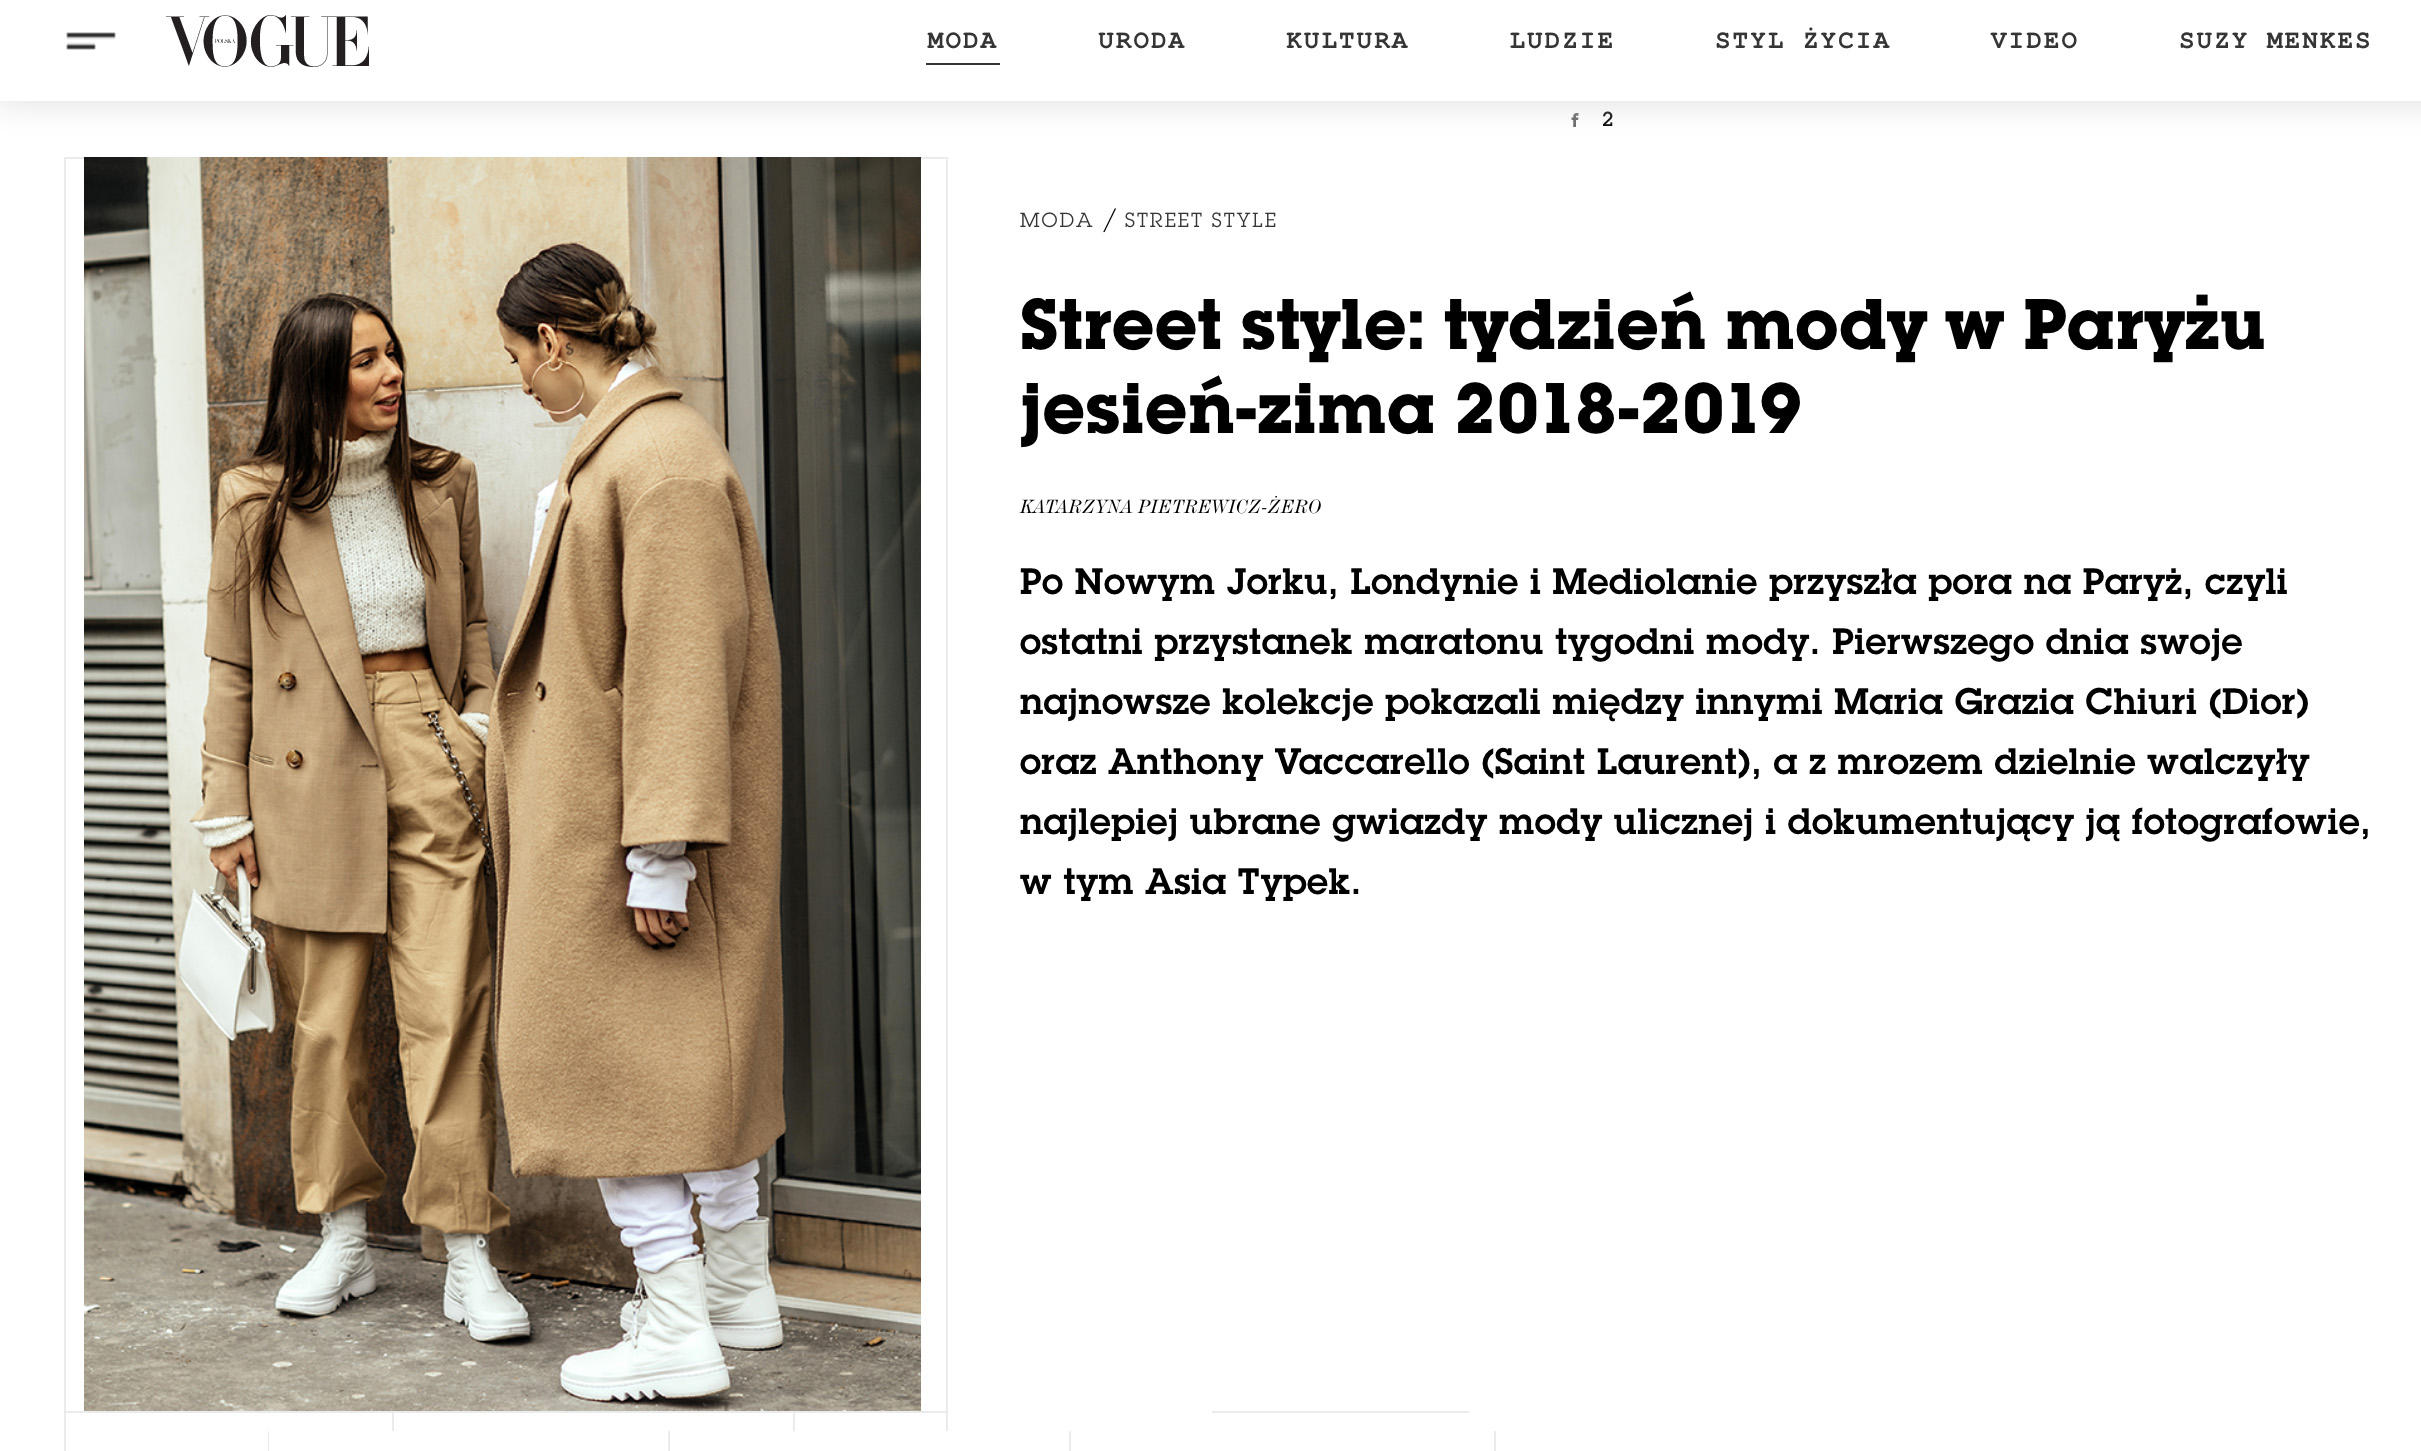 vogue alexcloset streetstyle